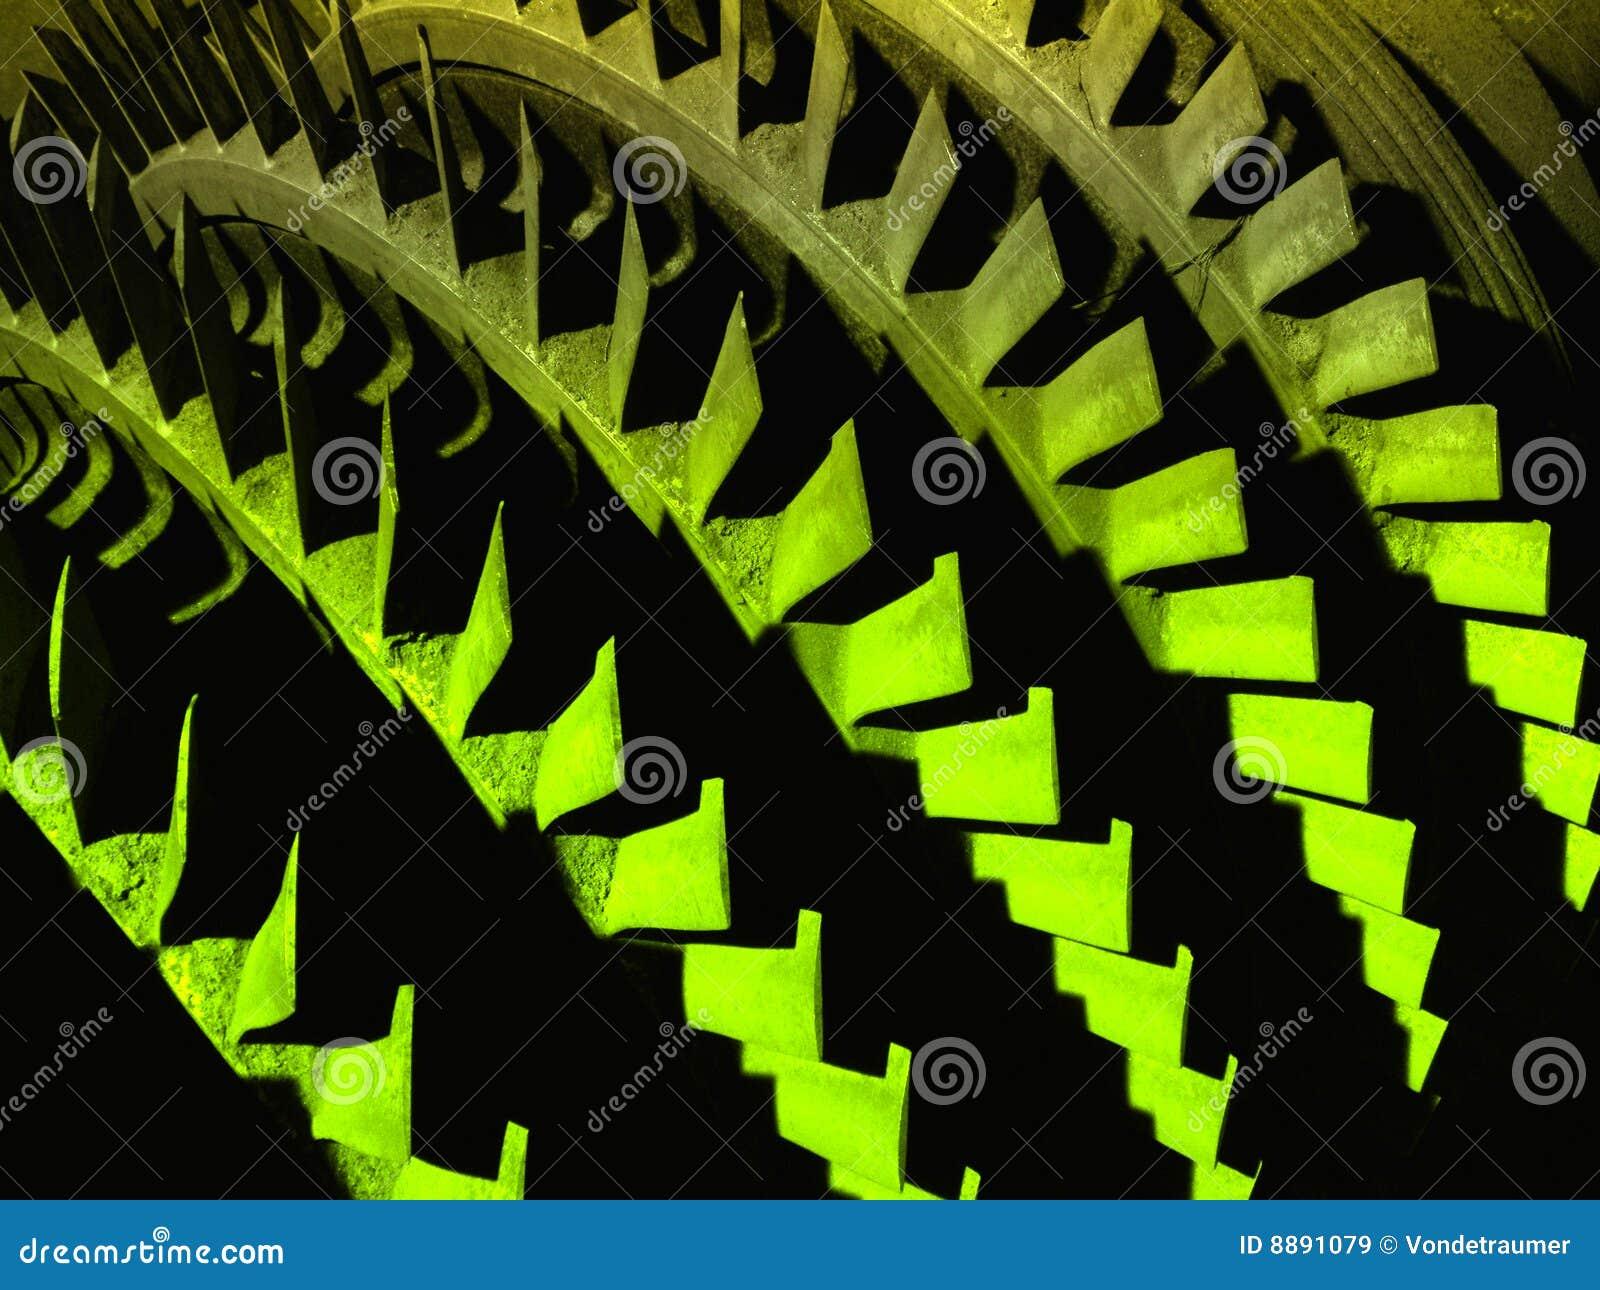 Raw Spin - Objekt